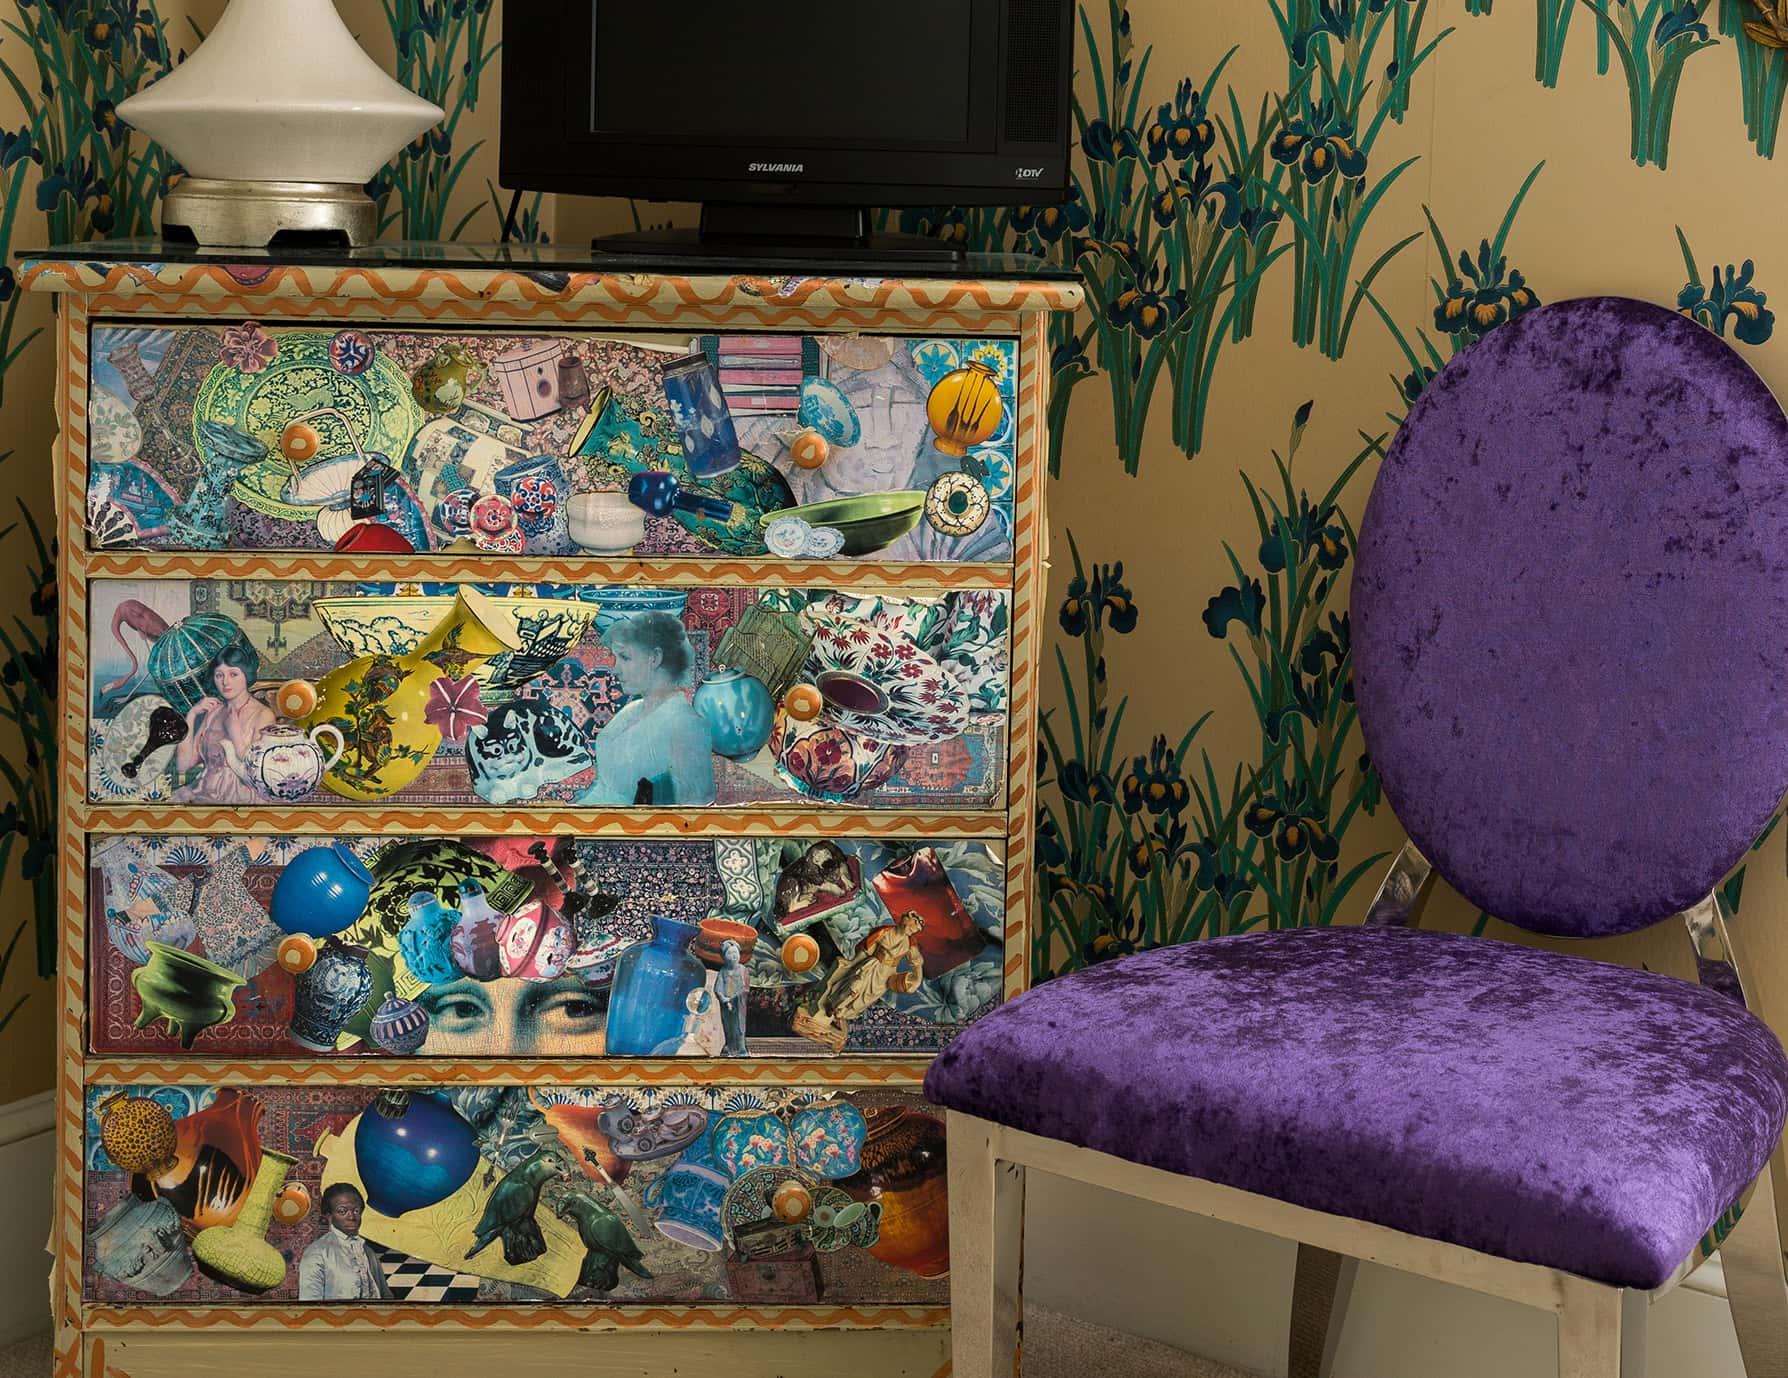 Iris Room chair and dresser - Portland Maine lodging